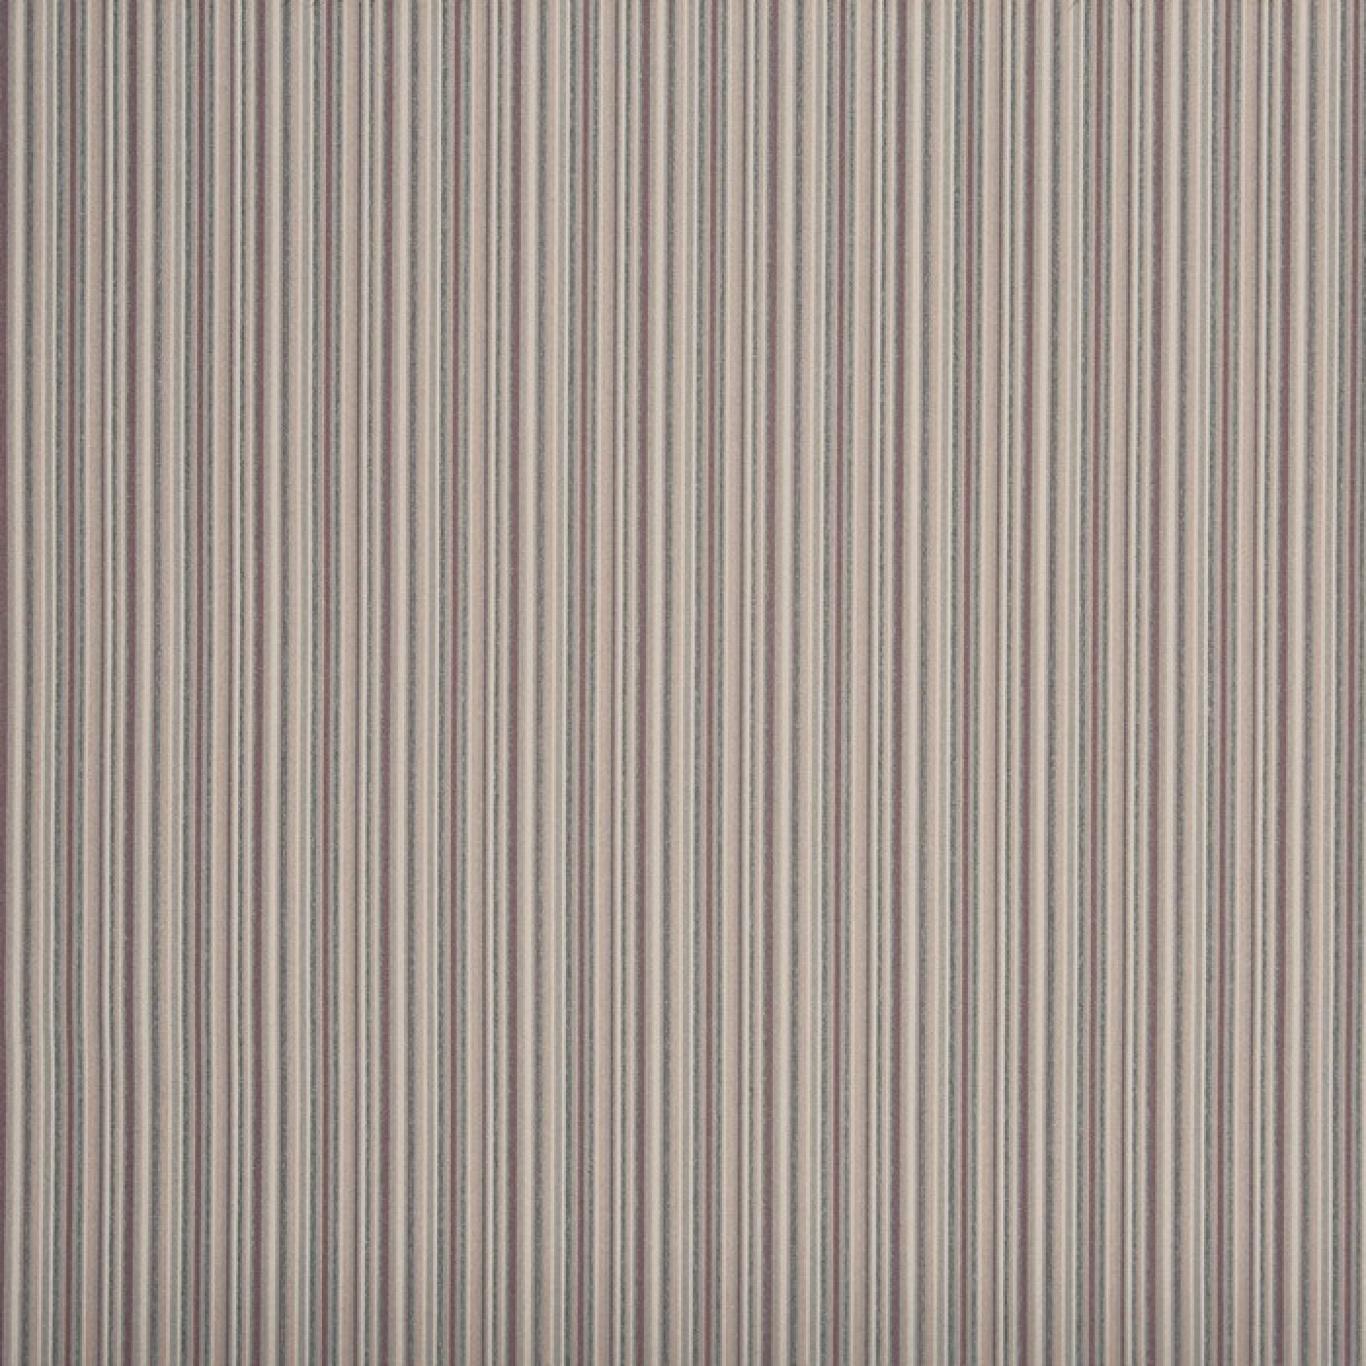 Image of Prestigious Langley Thistle FR Fabric 2018/995